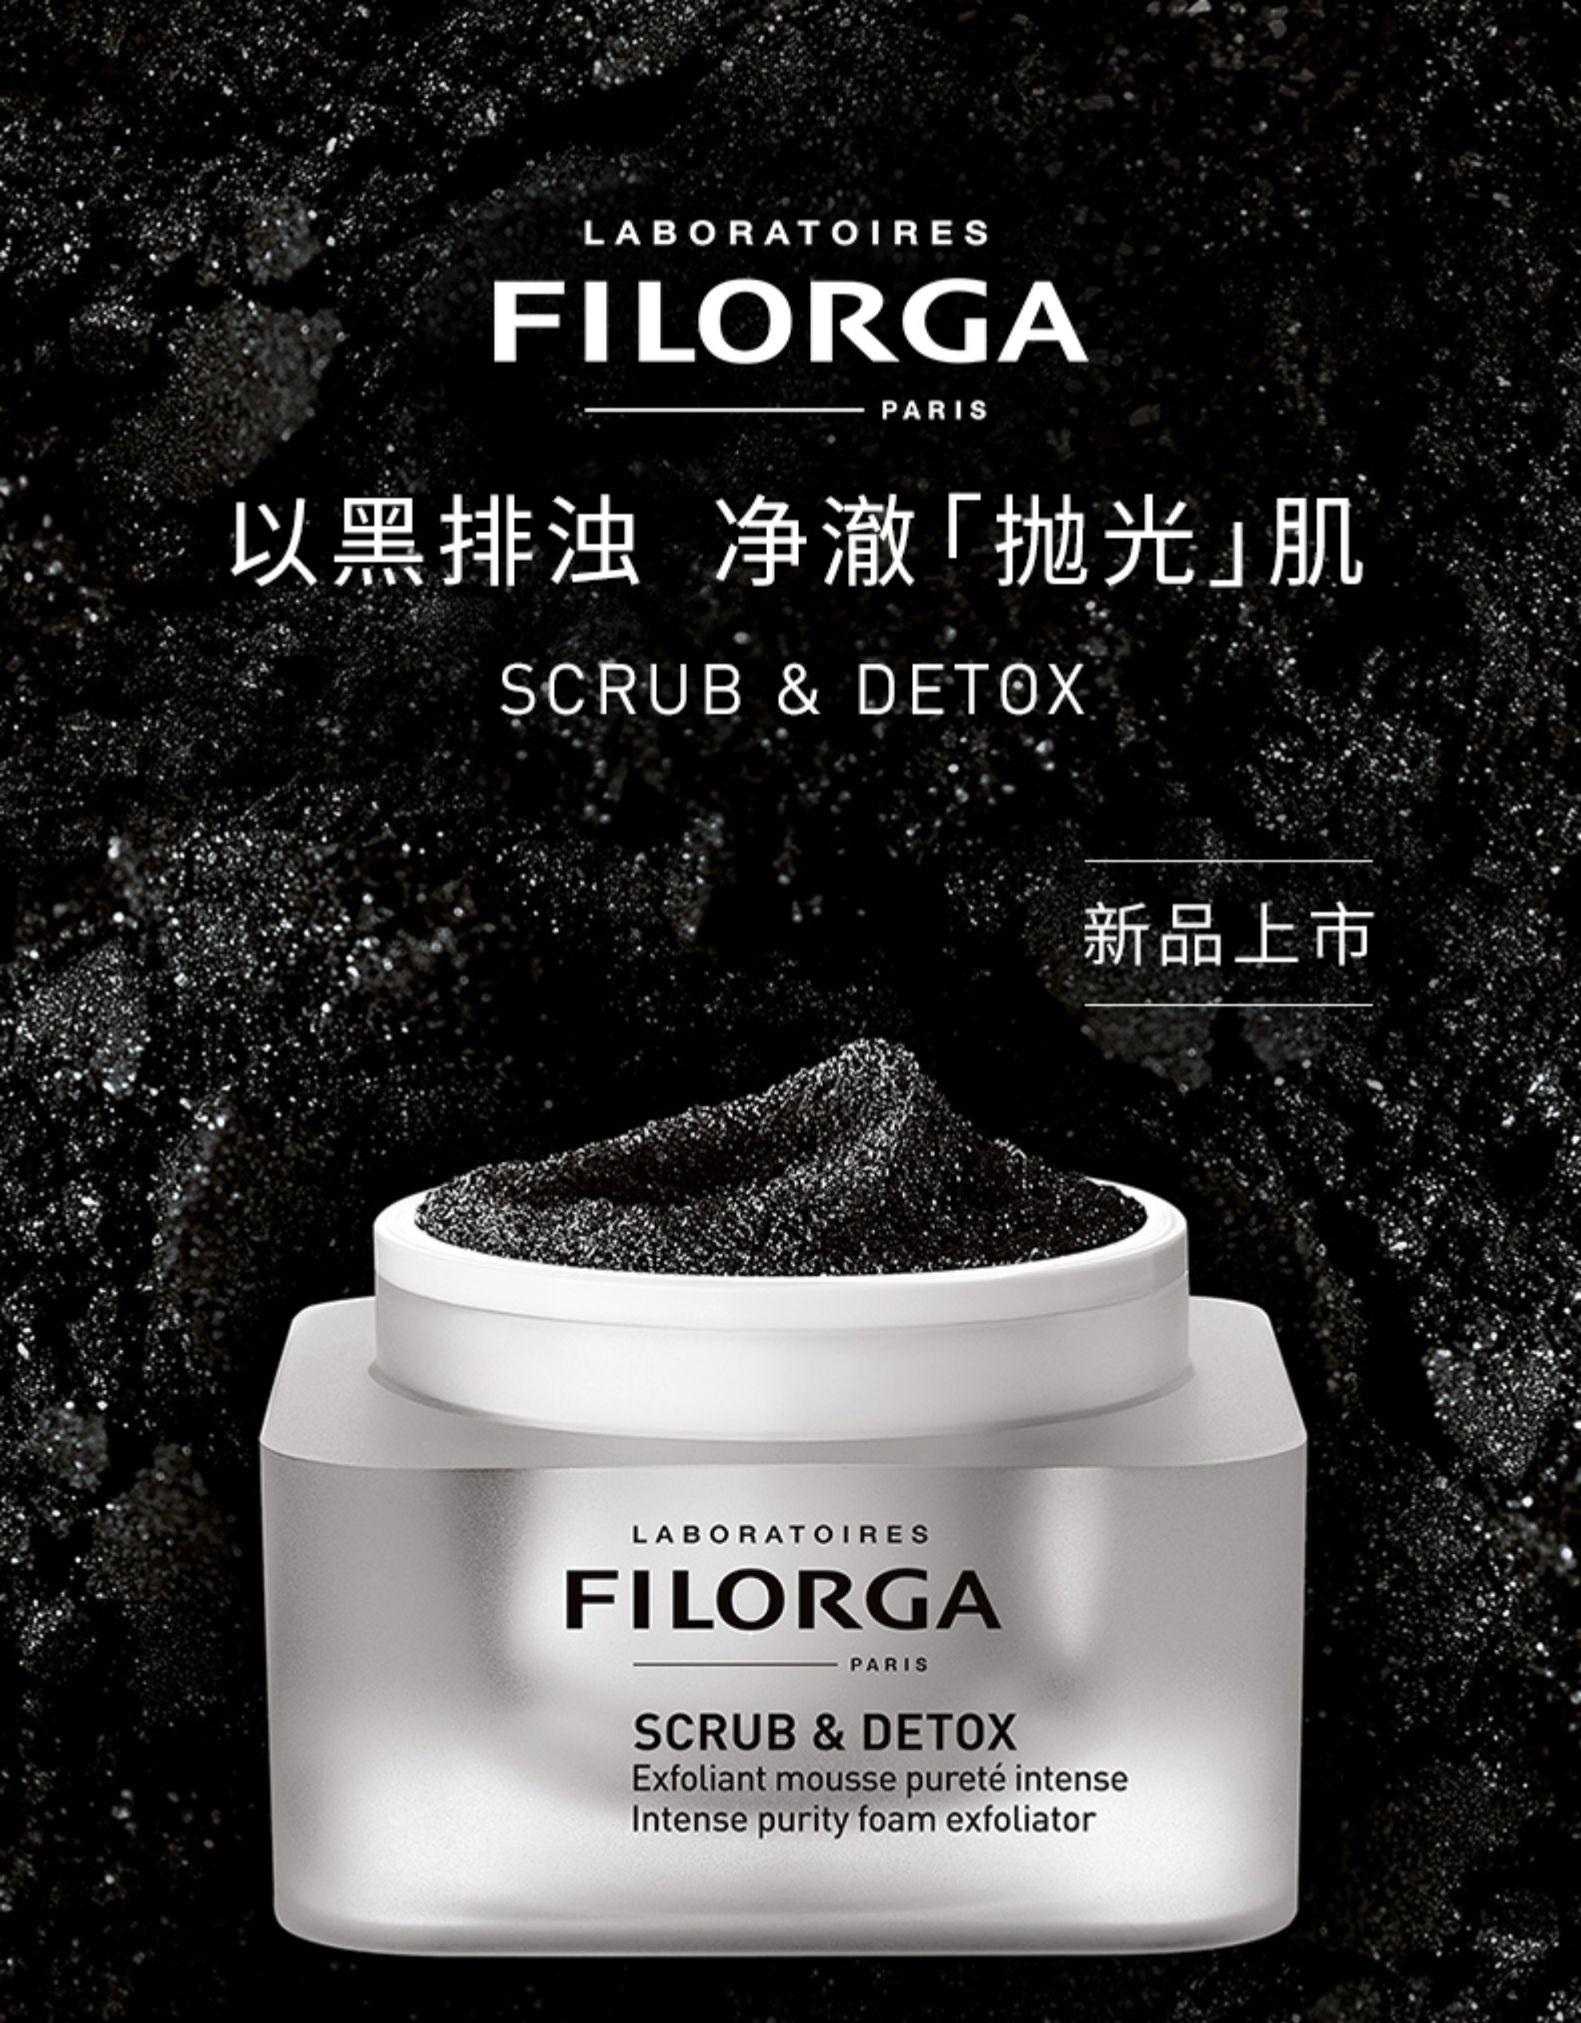 FILORGA 菲洛嘉 清润净透磨砂面膜 50ml*2件 双重优惠折后¥299包邮包税